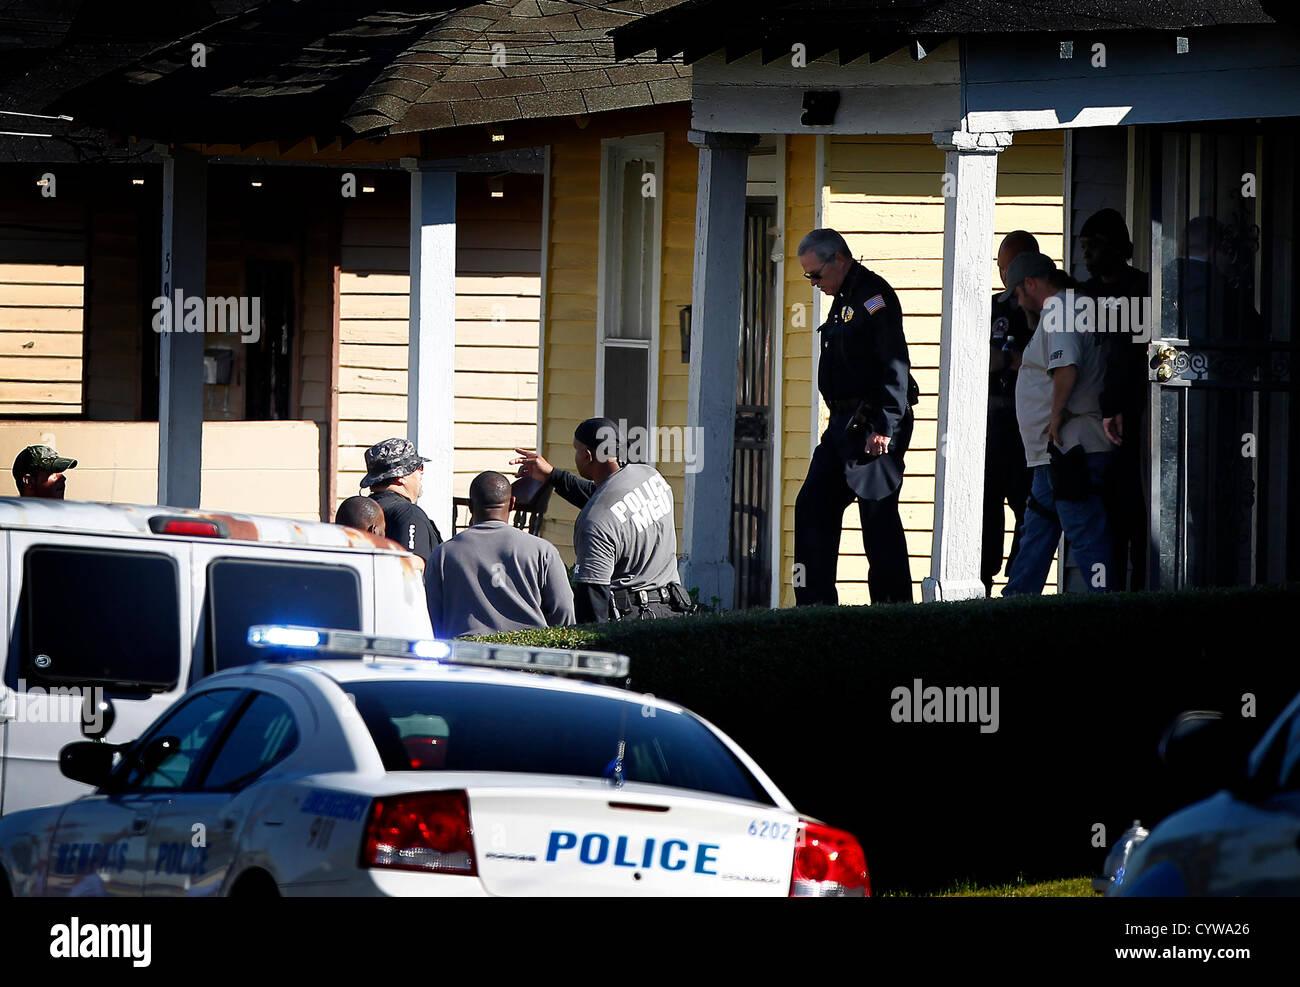 Nov. 8, 2012 - Memphis, TN, U.S. - November 8, 2012 – Memphis Police survey the scene where an officer was - Stock Image